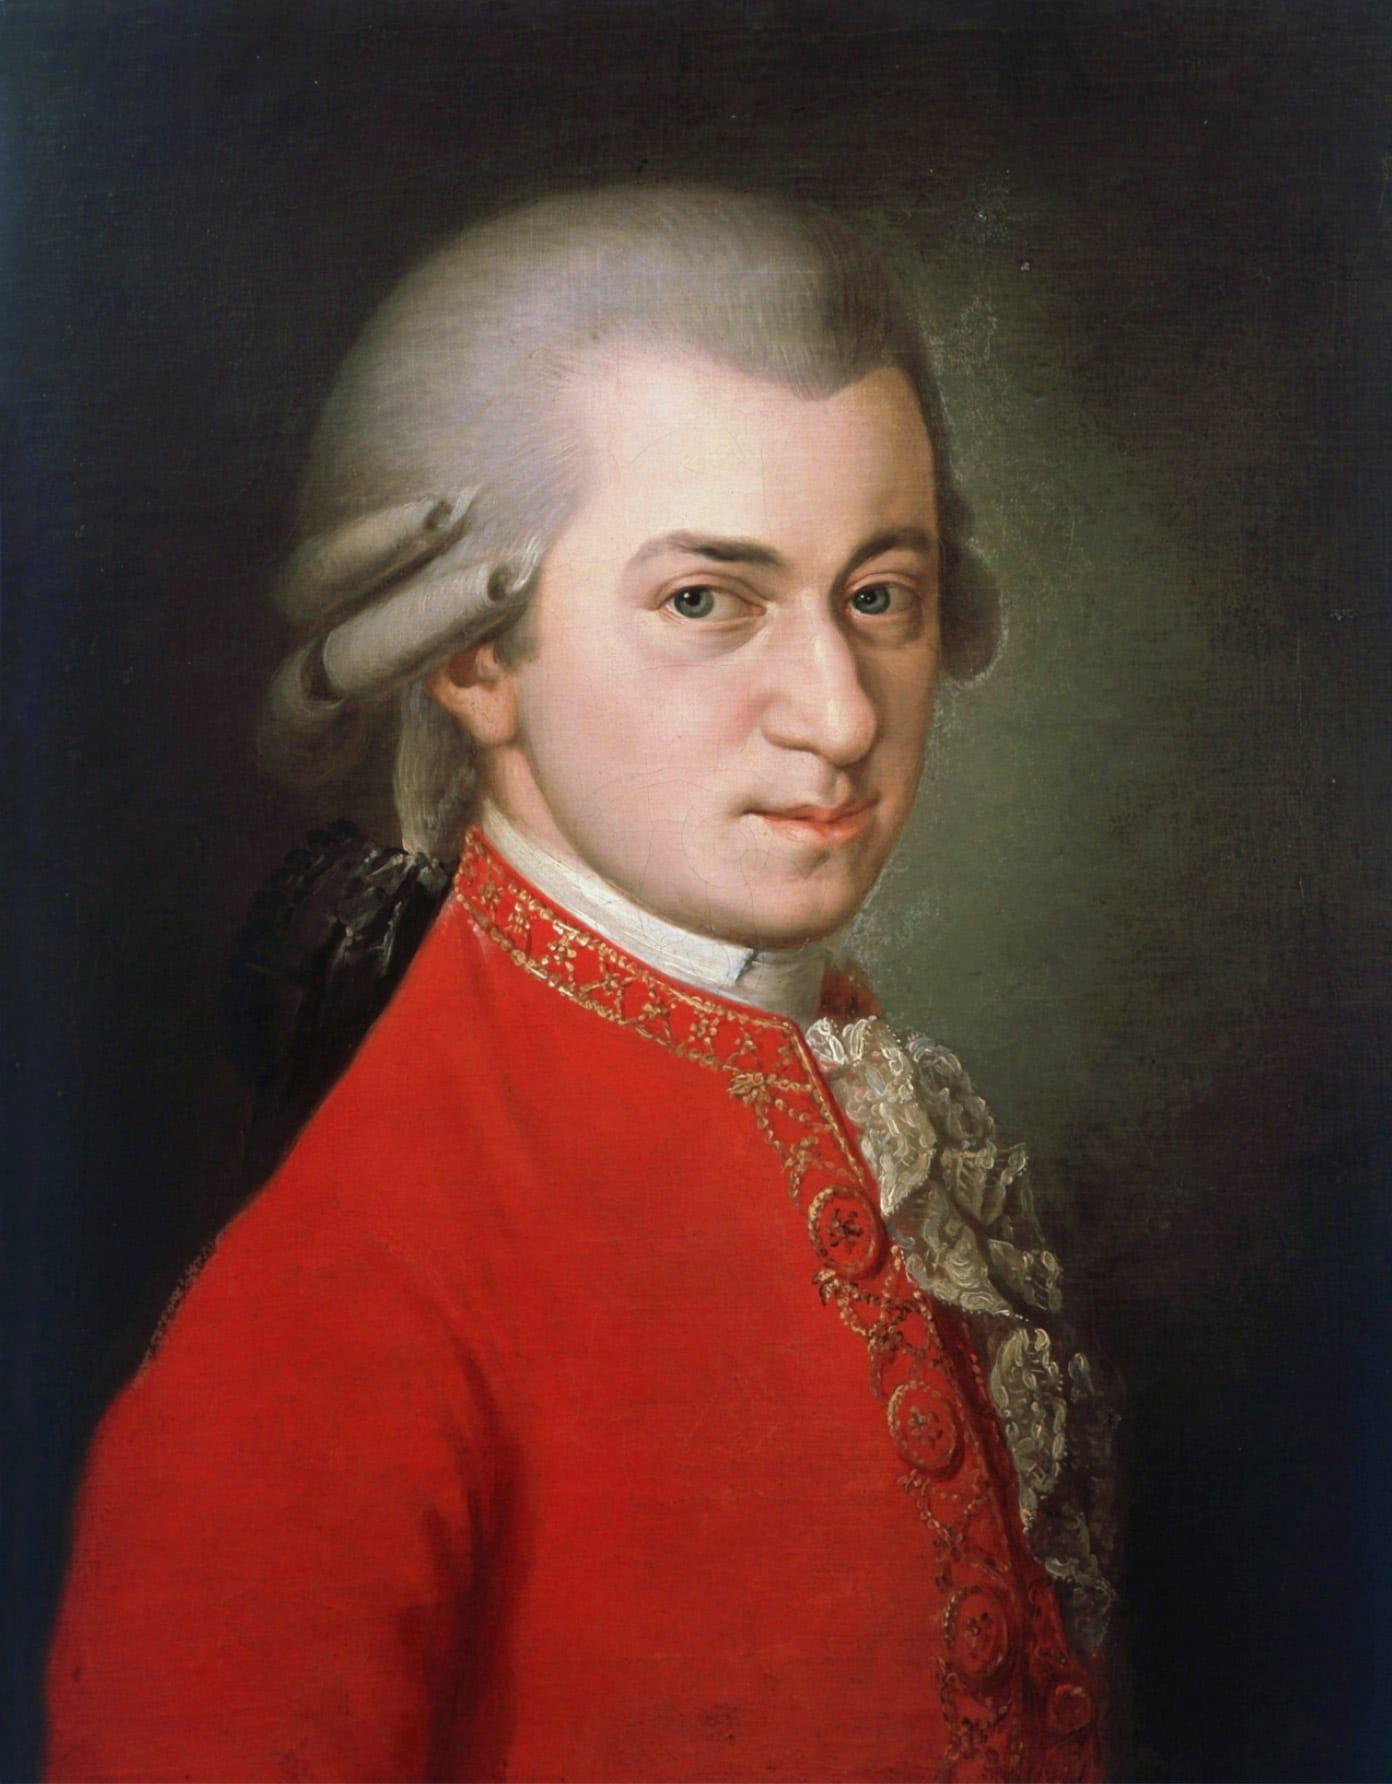 1ecfe9e483709e5b9994eba0eb0f4cdf 1 - 1791: Mozart's Last Year